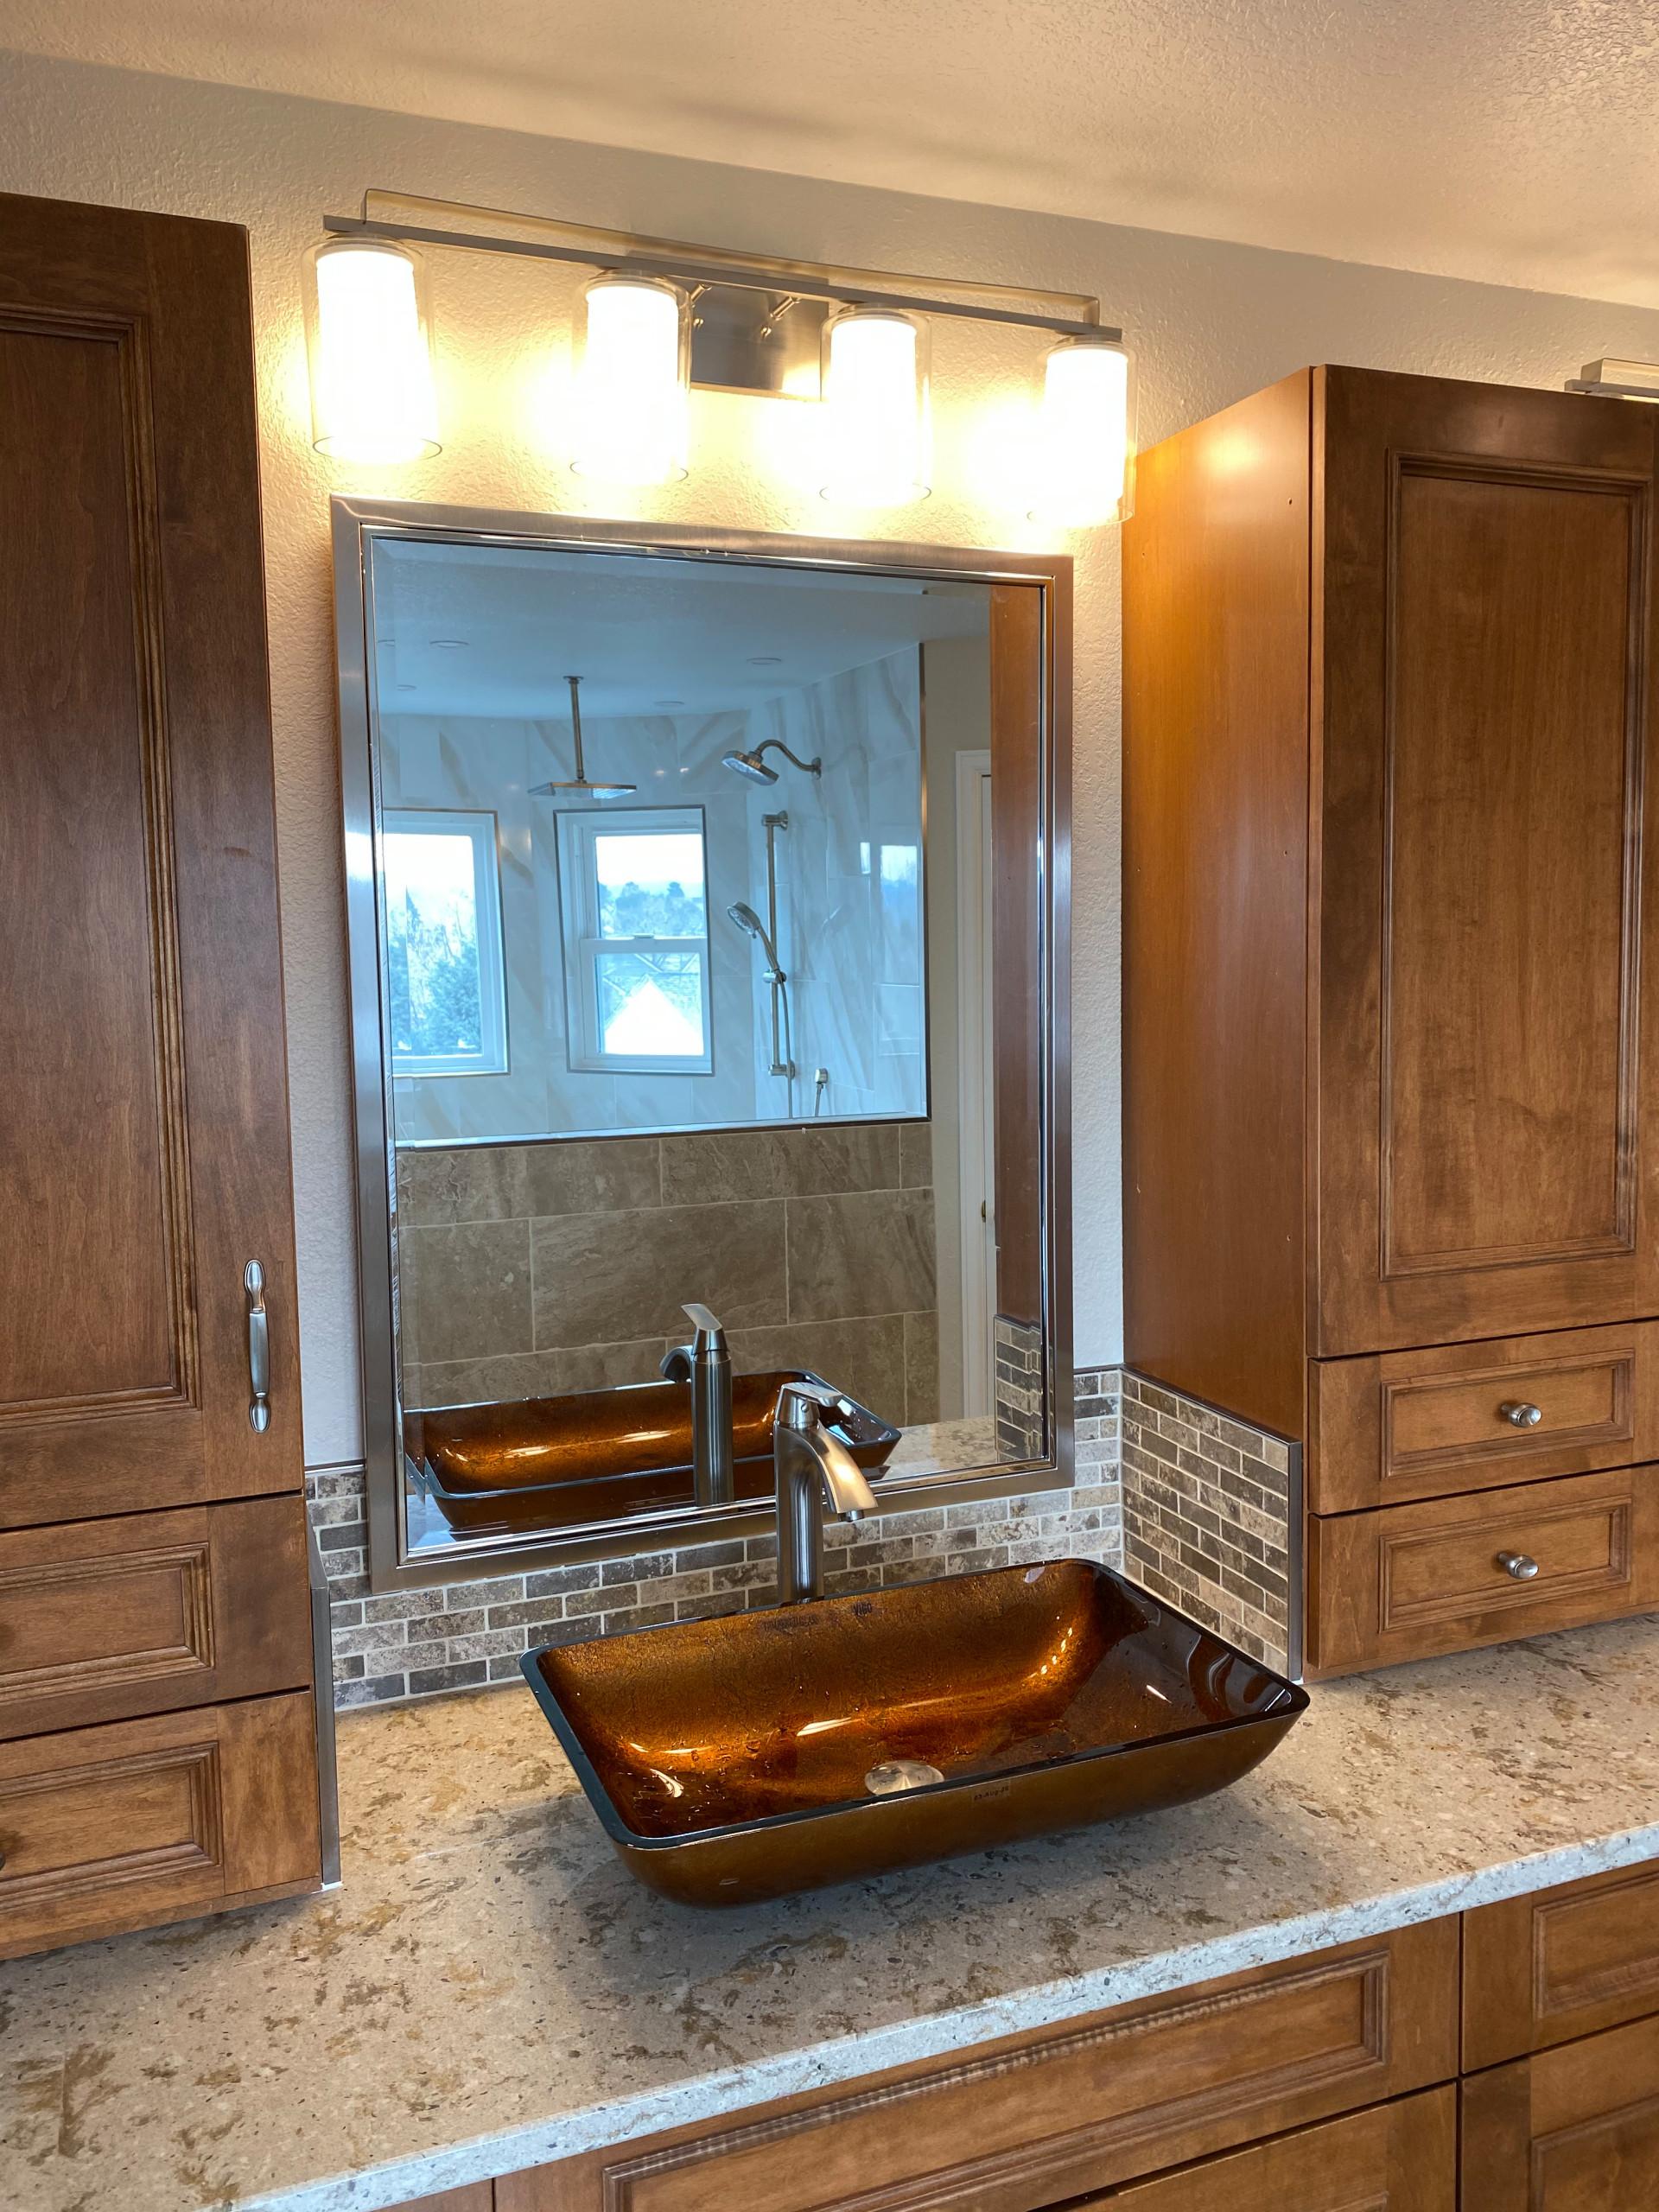 Young Bathroom Remodel